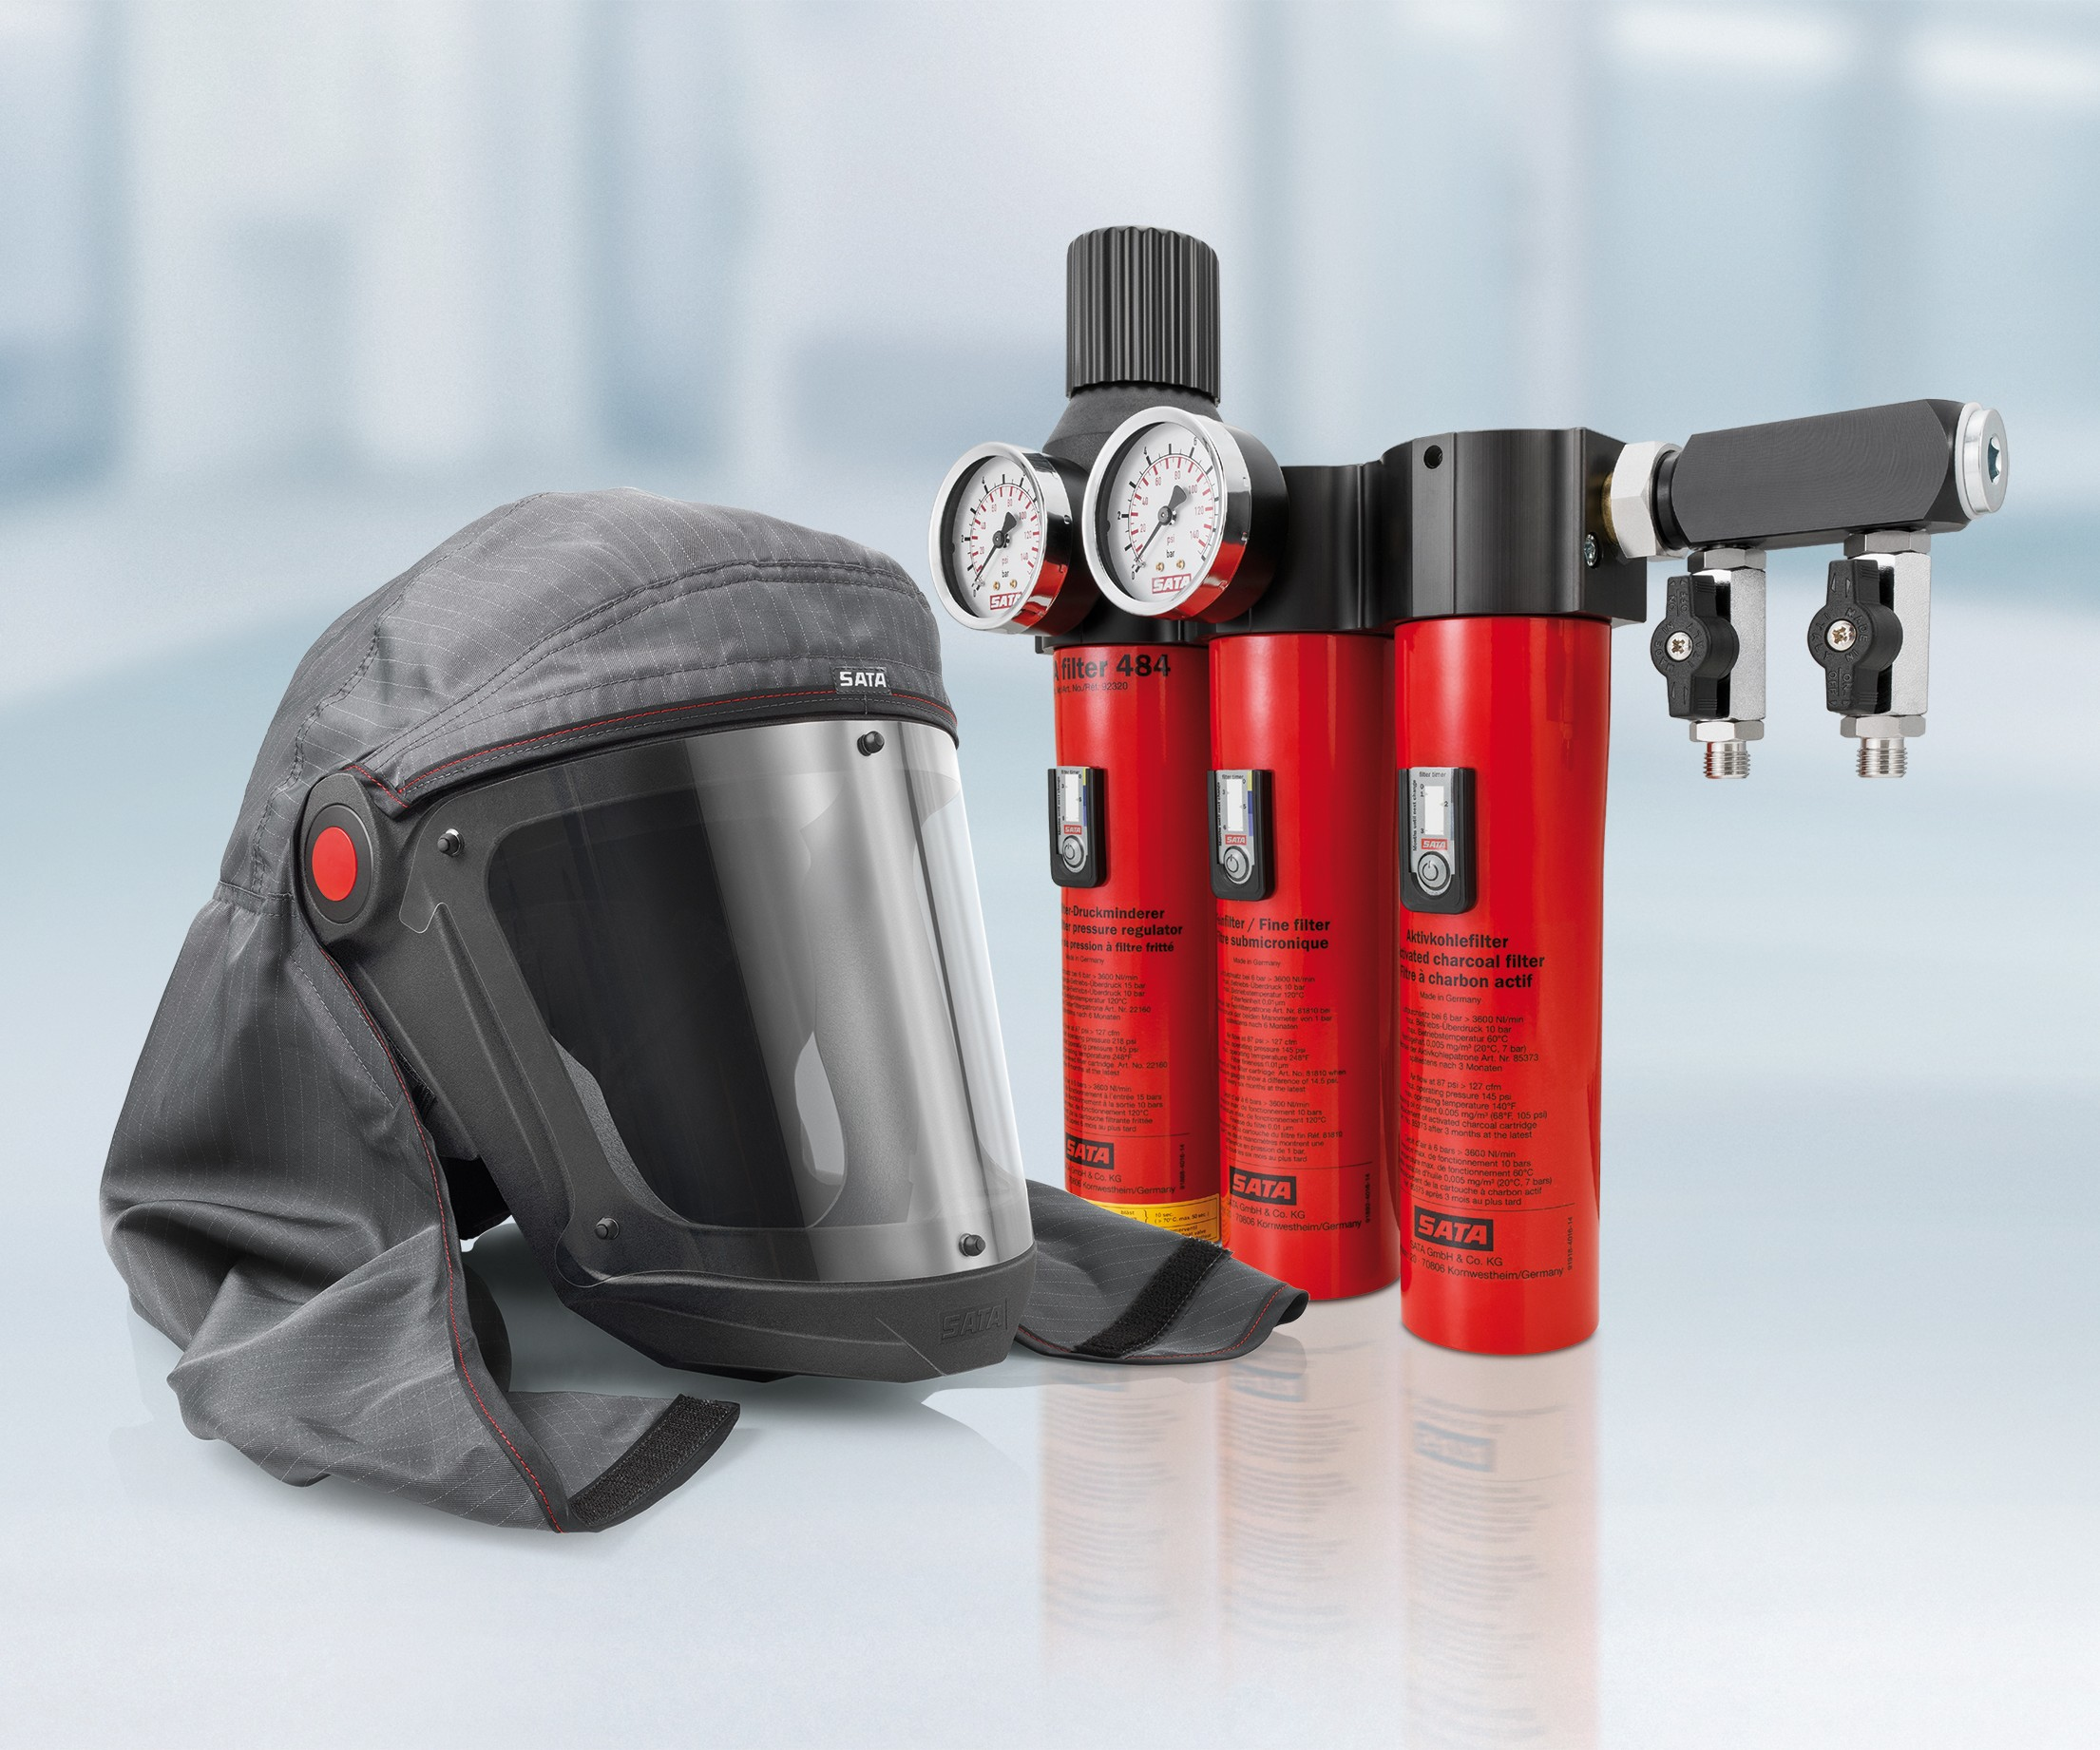 Sata Spray Equipment Air Vision 5000 supplied-air respirator and Sata 400 filter system